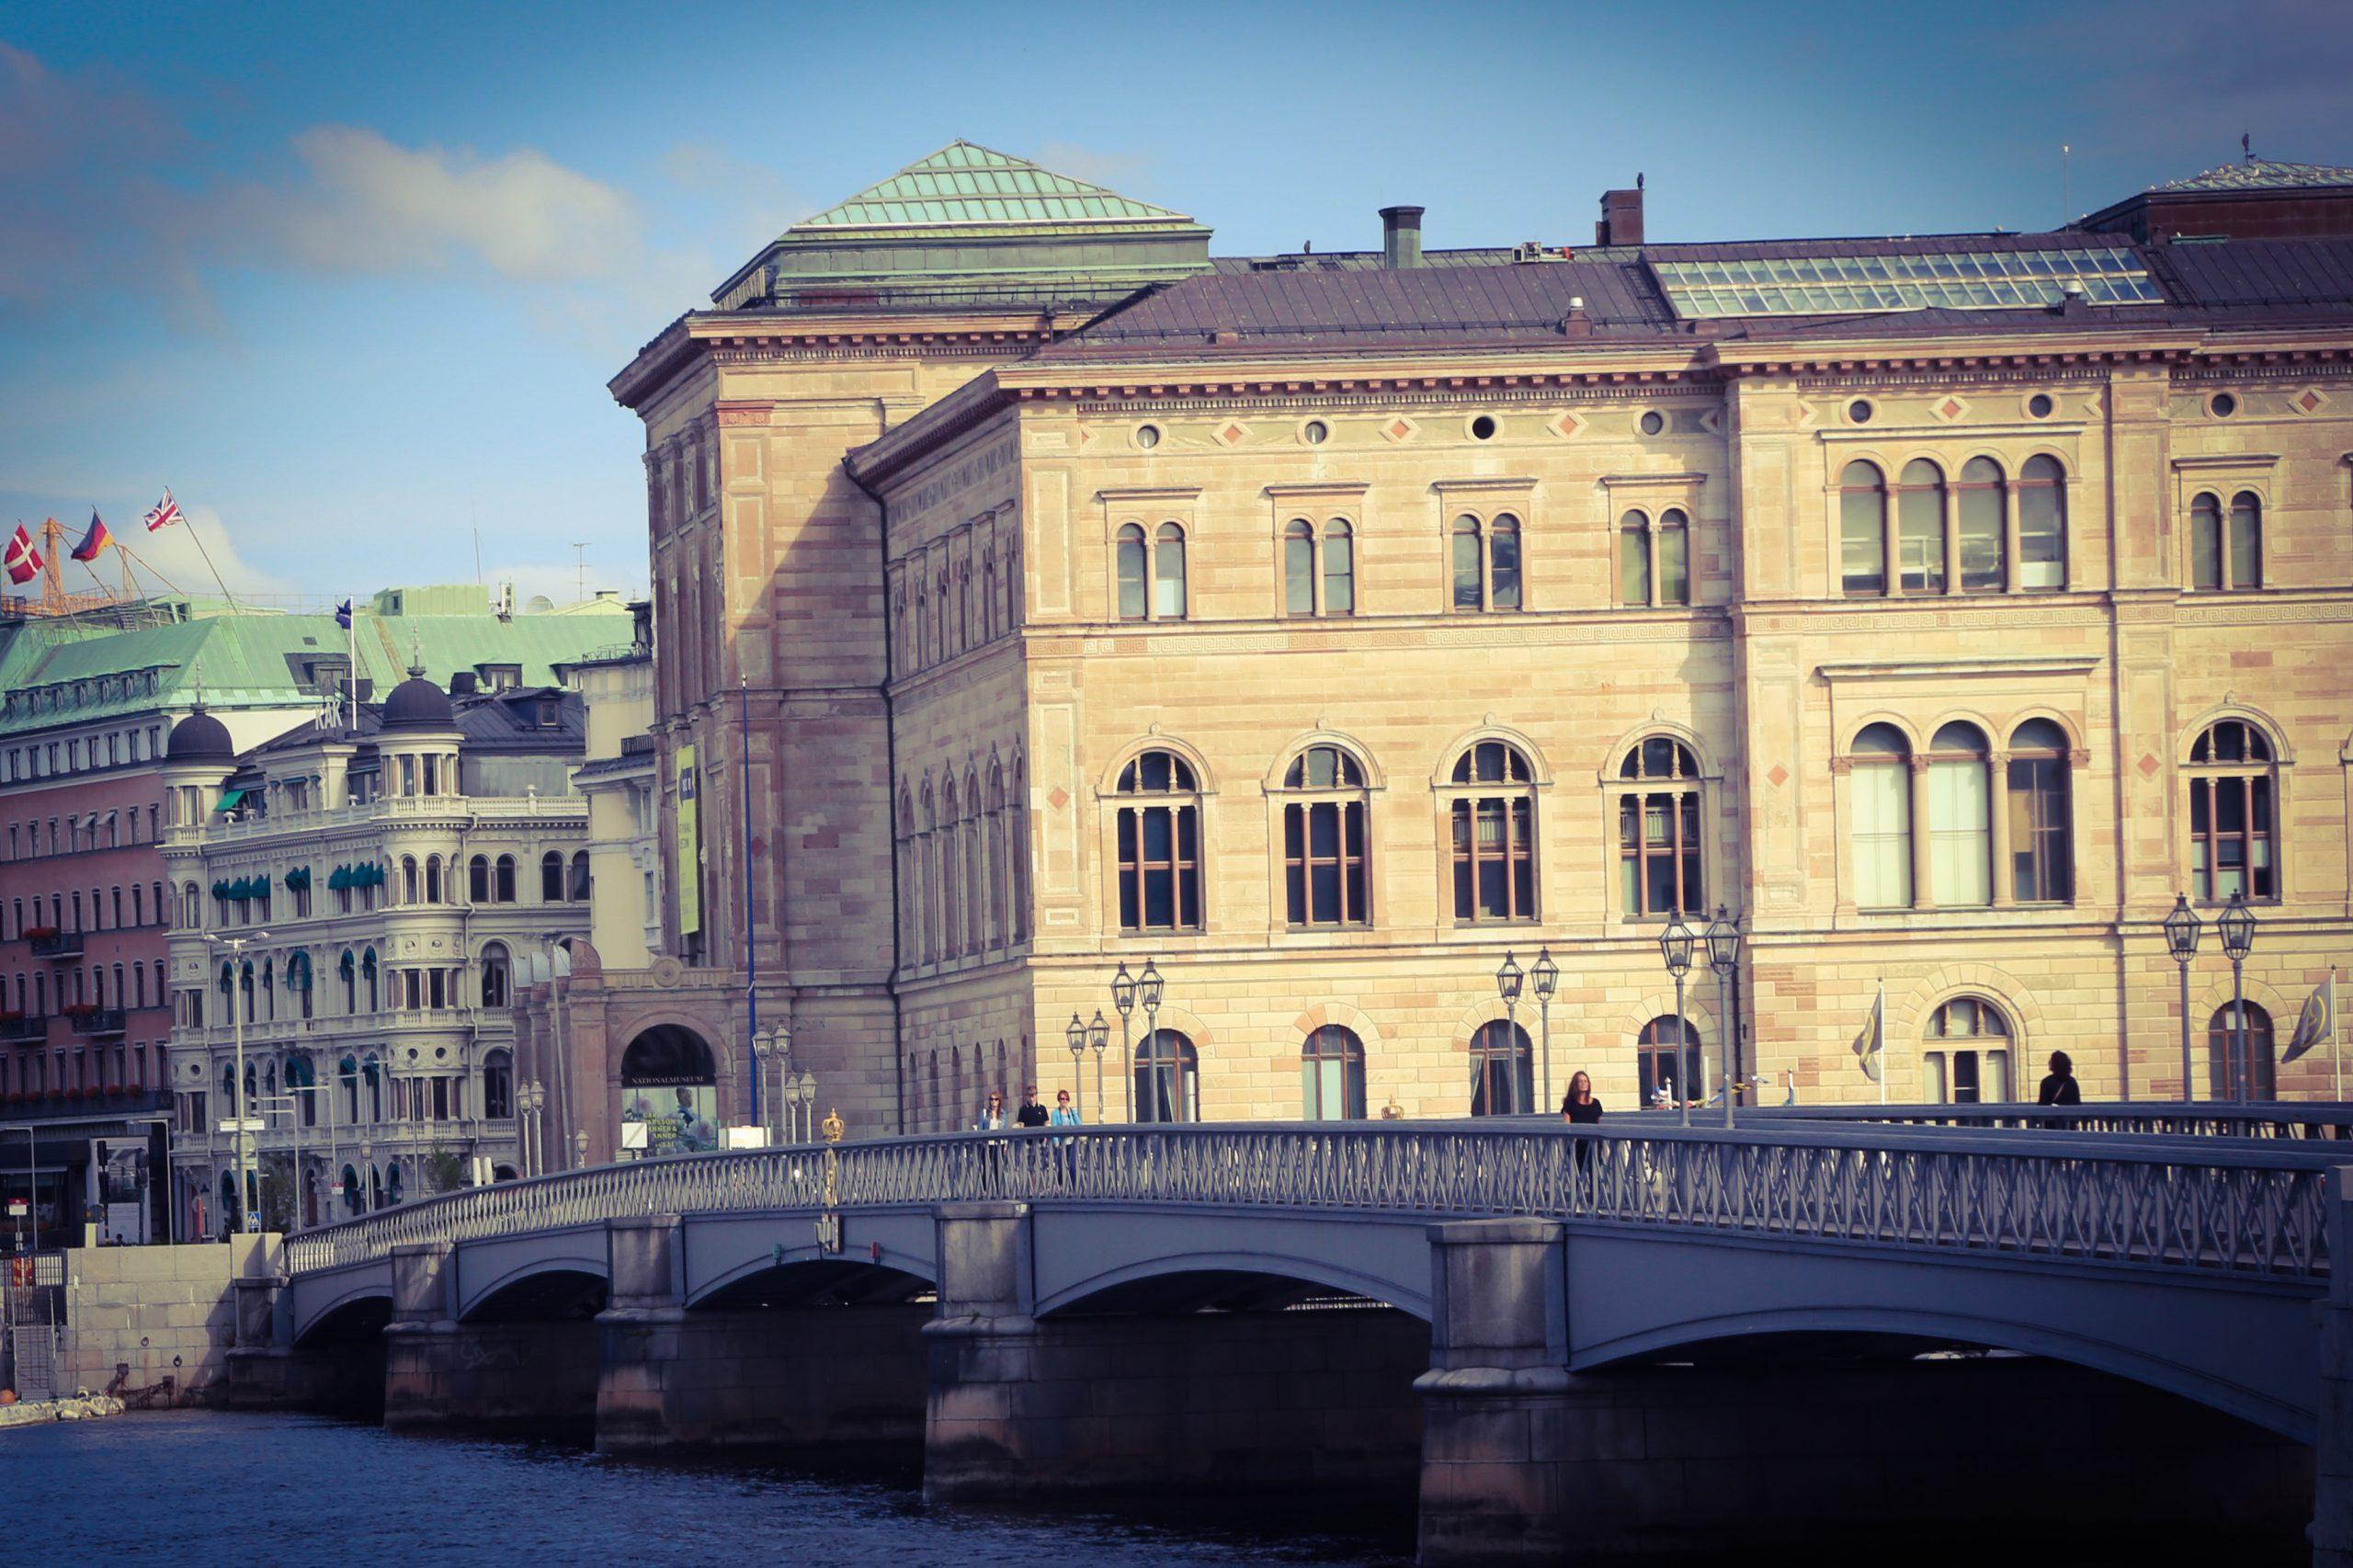 Nationalmuseum, Sweden's premier museum of art and design